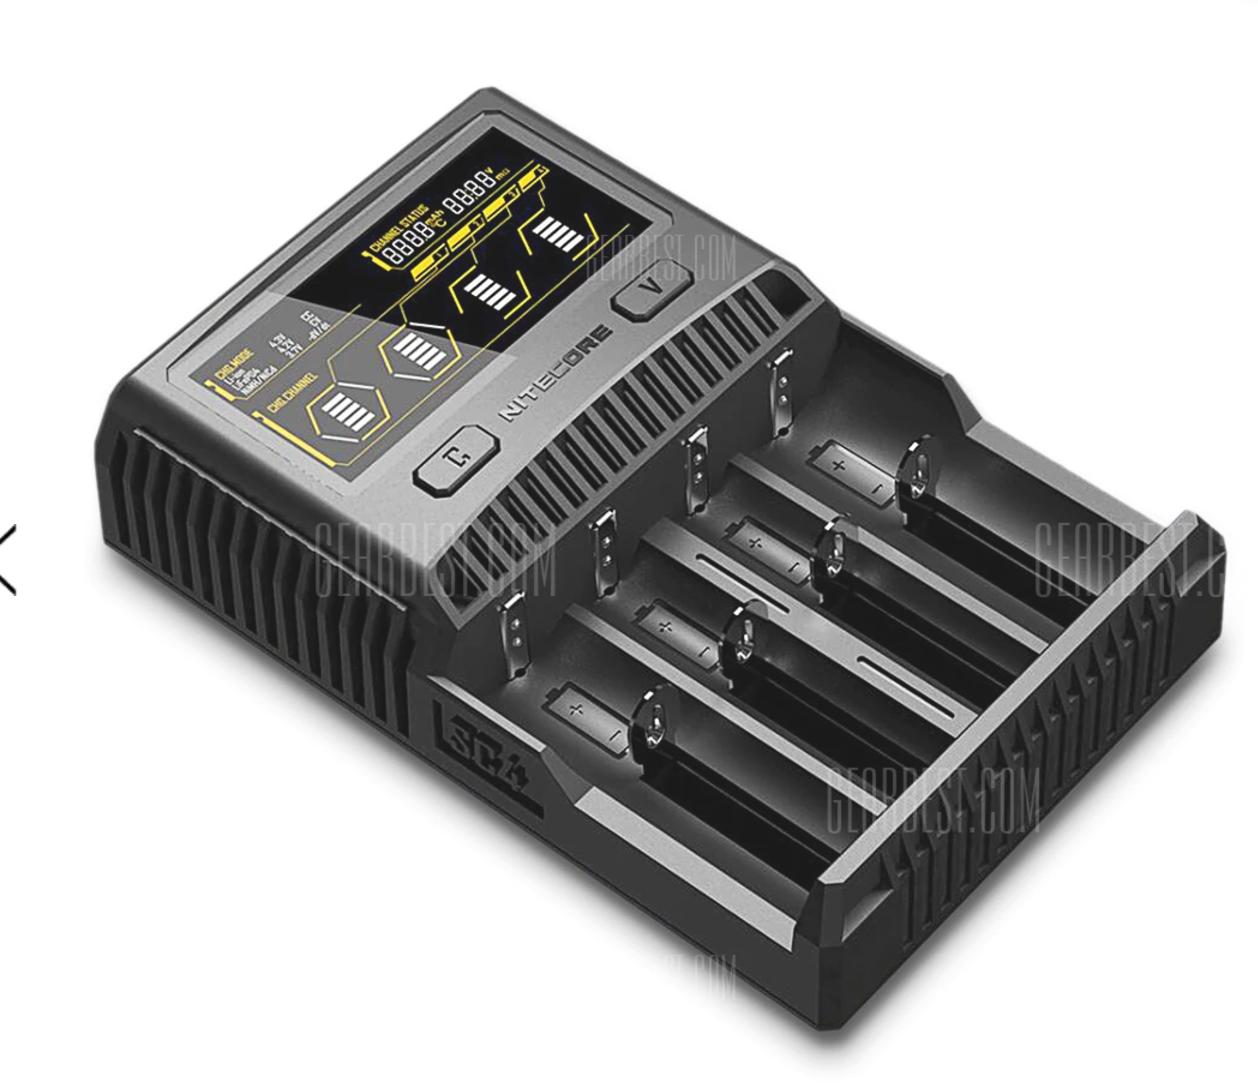 GearBest Nitecore SC4 Li-Ion/Ni-MH Battery Charger